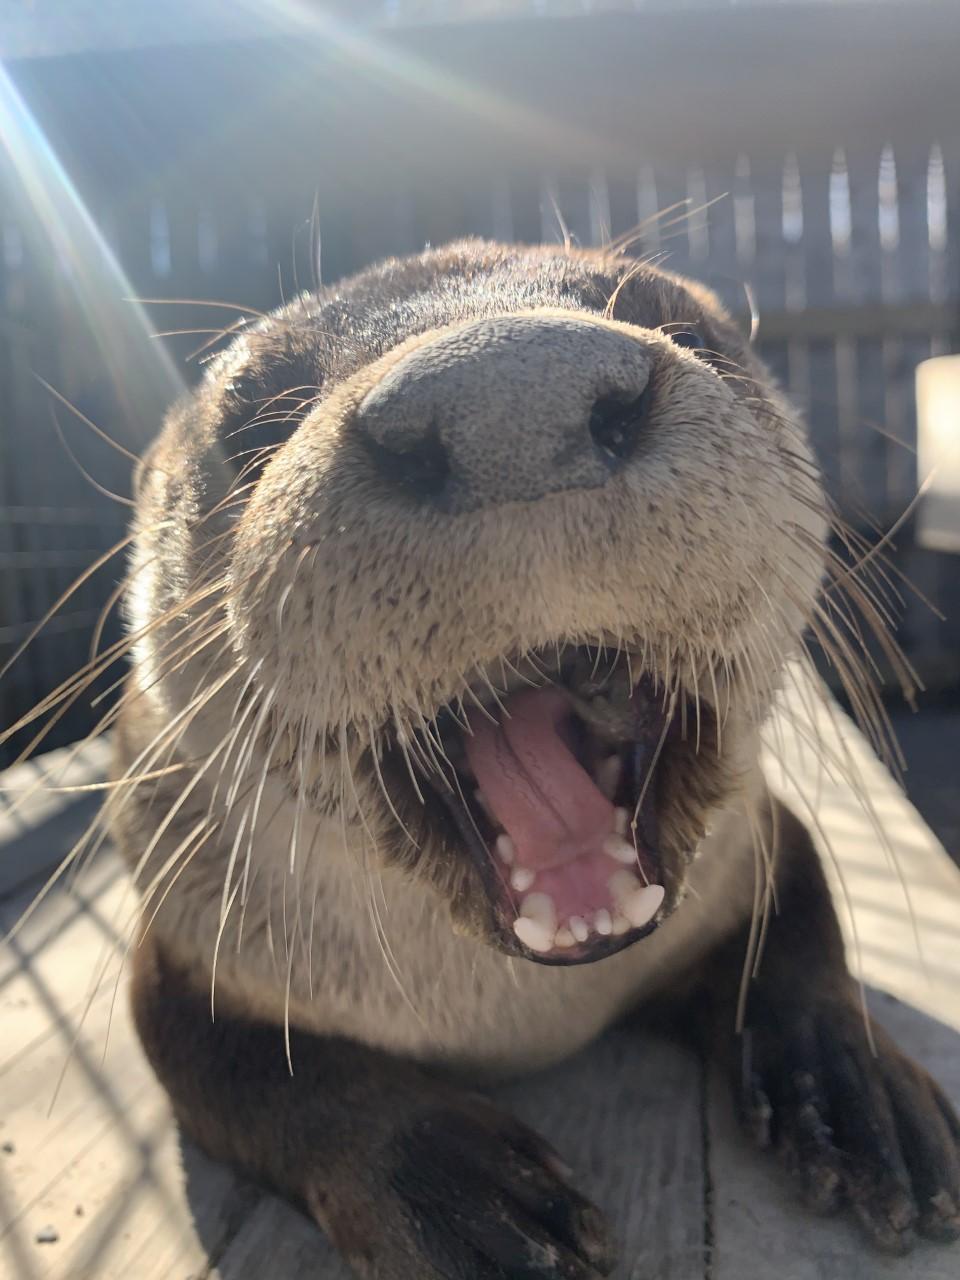 North American River Otter Habitat Exhibit